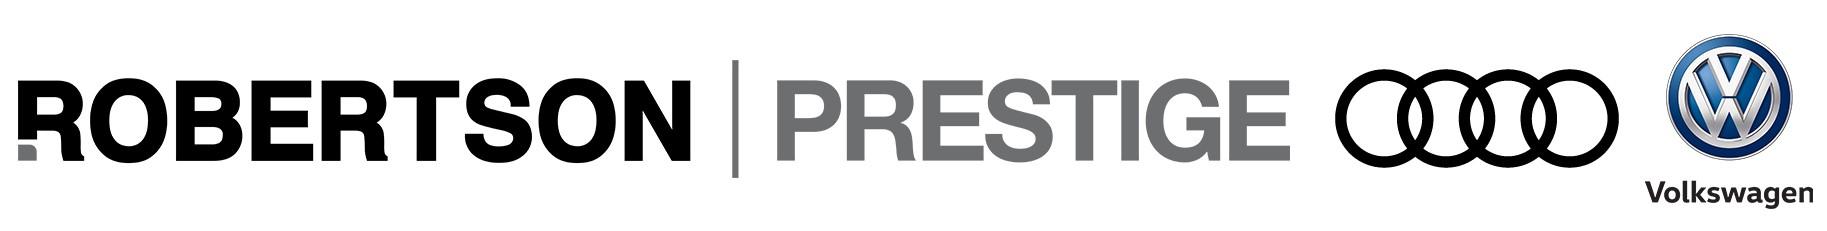 Robertson Prestige with brands.jpg